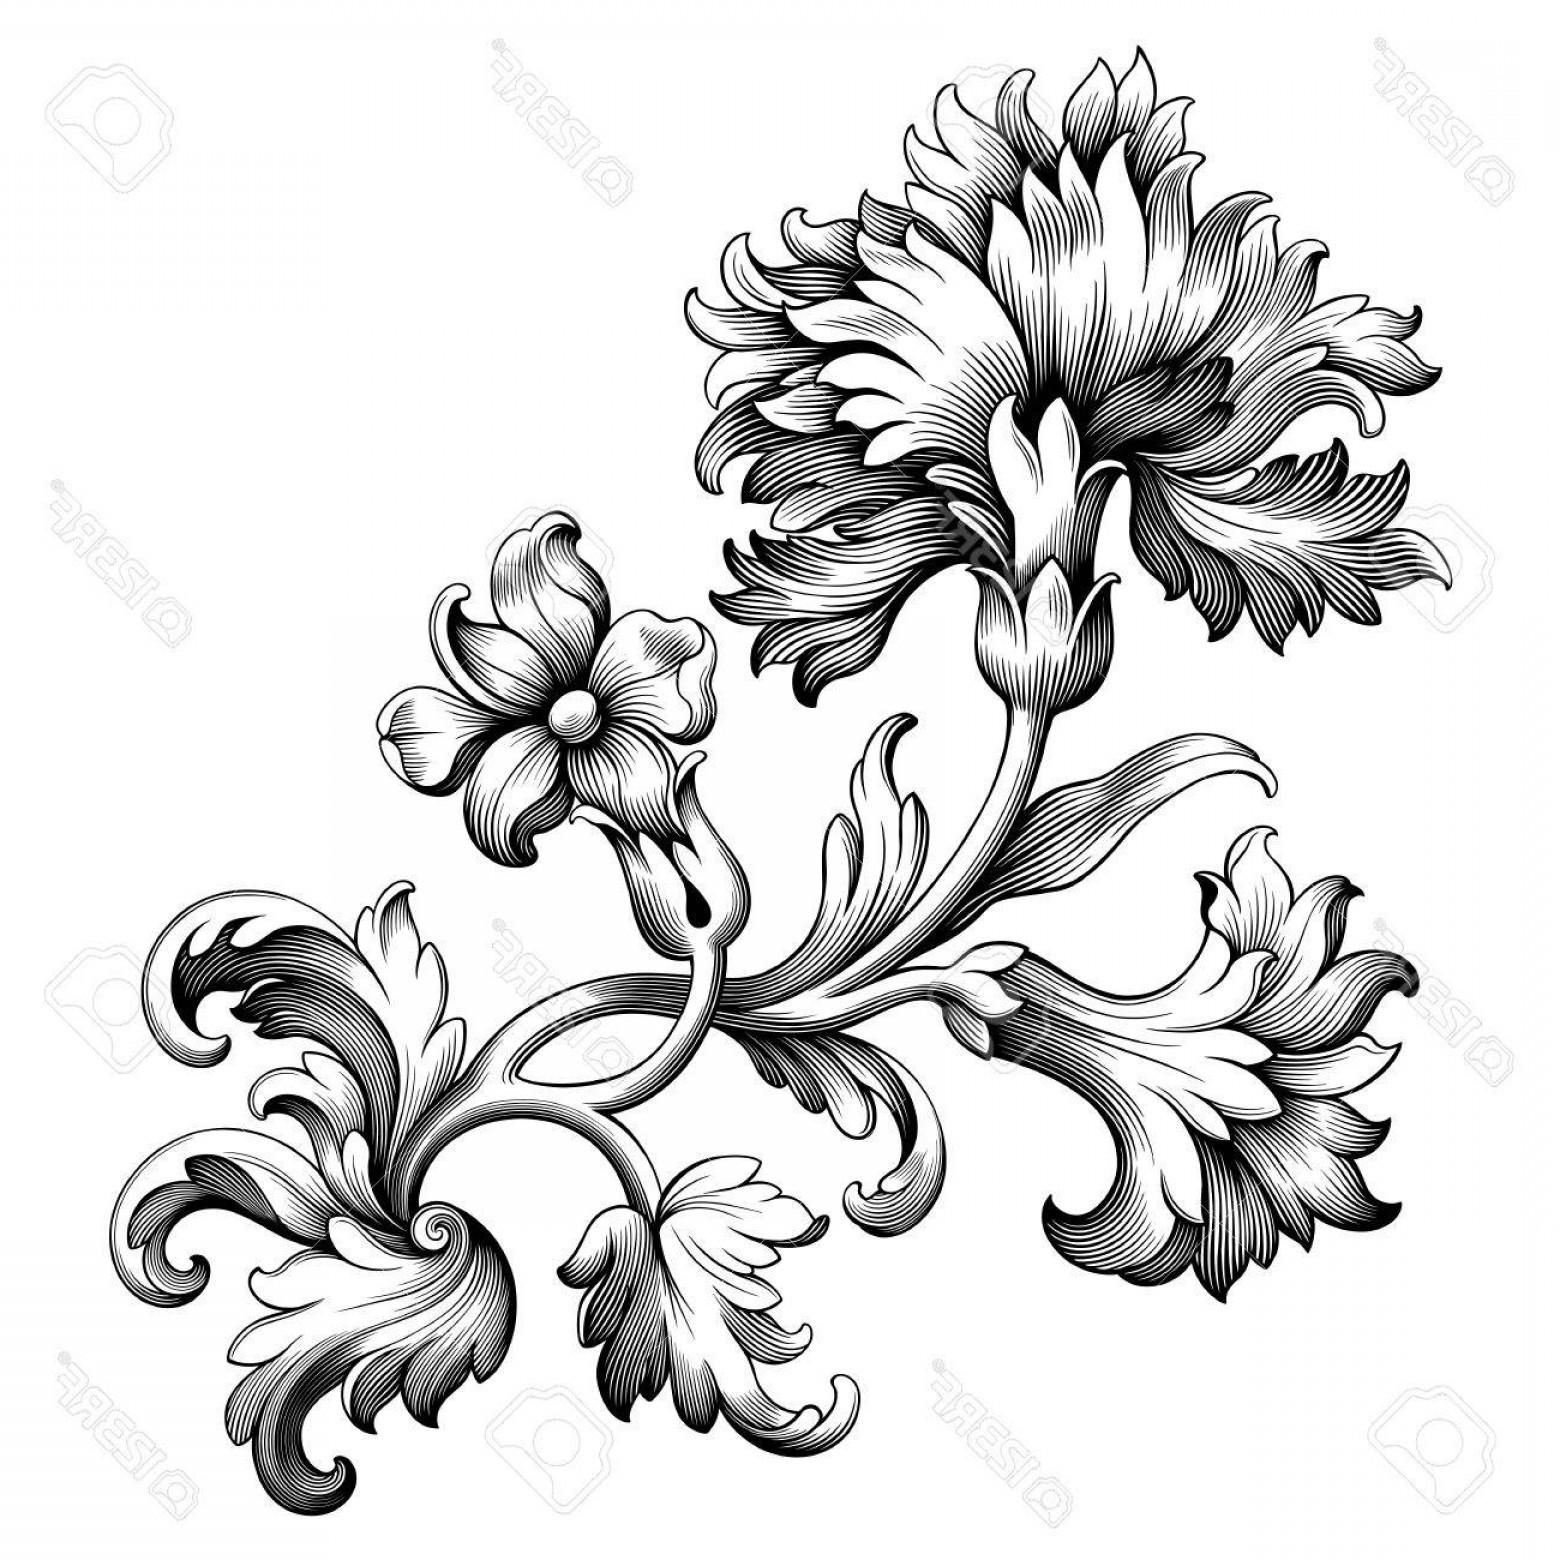 1560x1560 Photostock Vector Rose Peony Carnation Flower Vintage Baroque